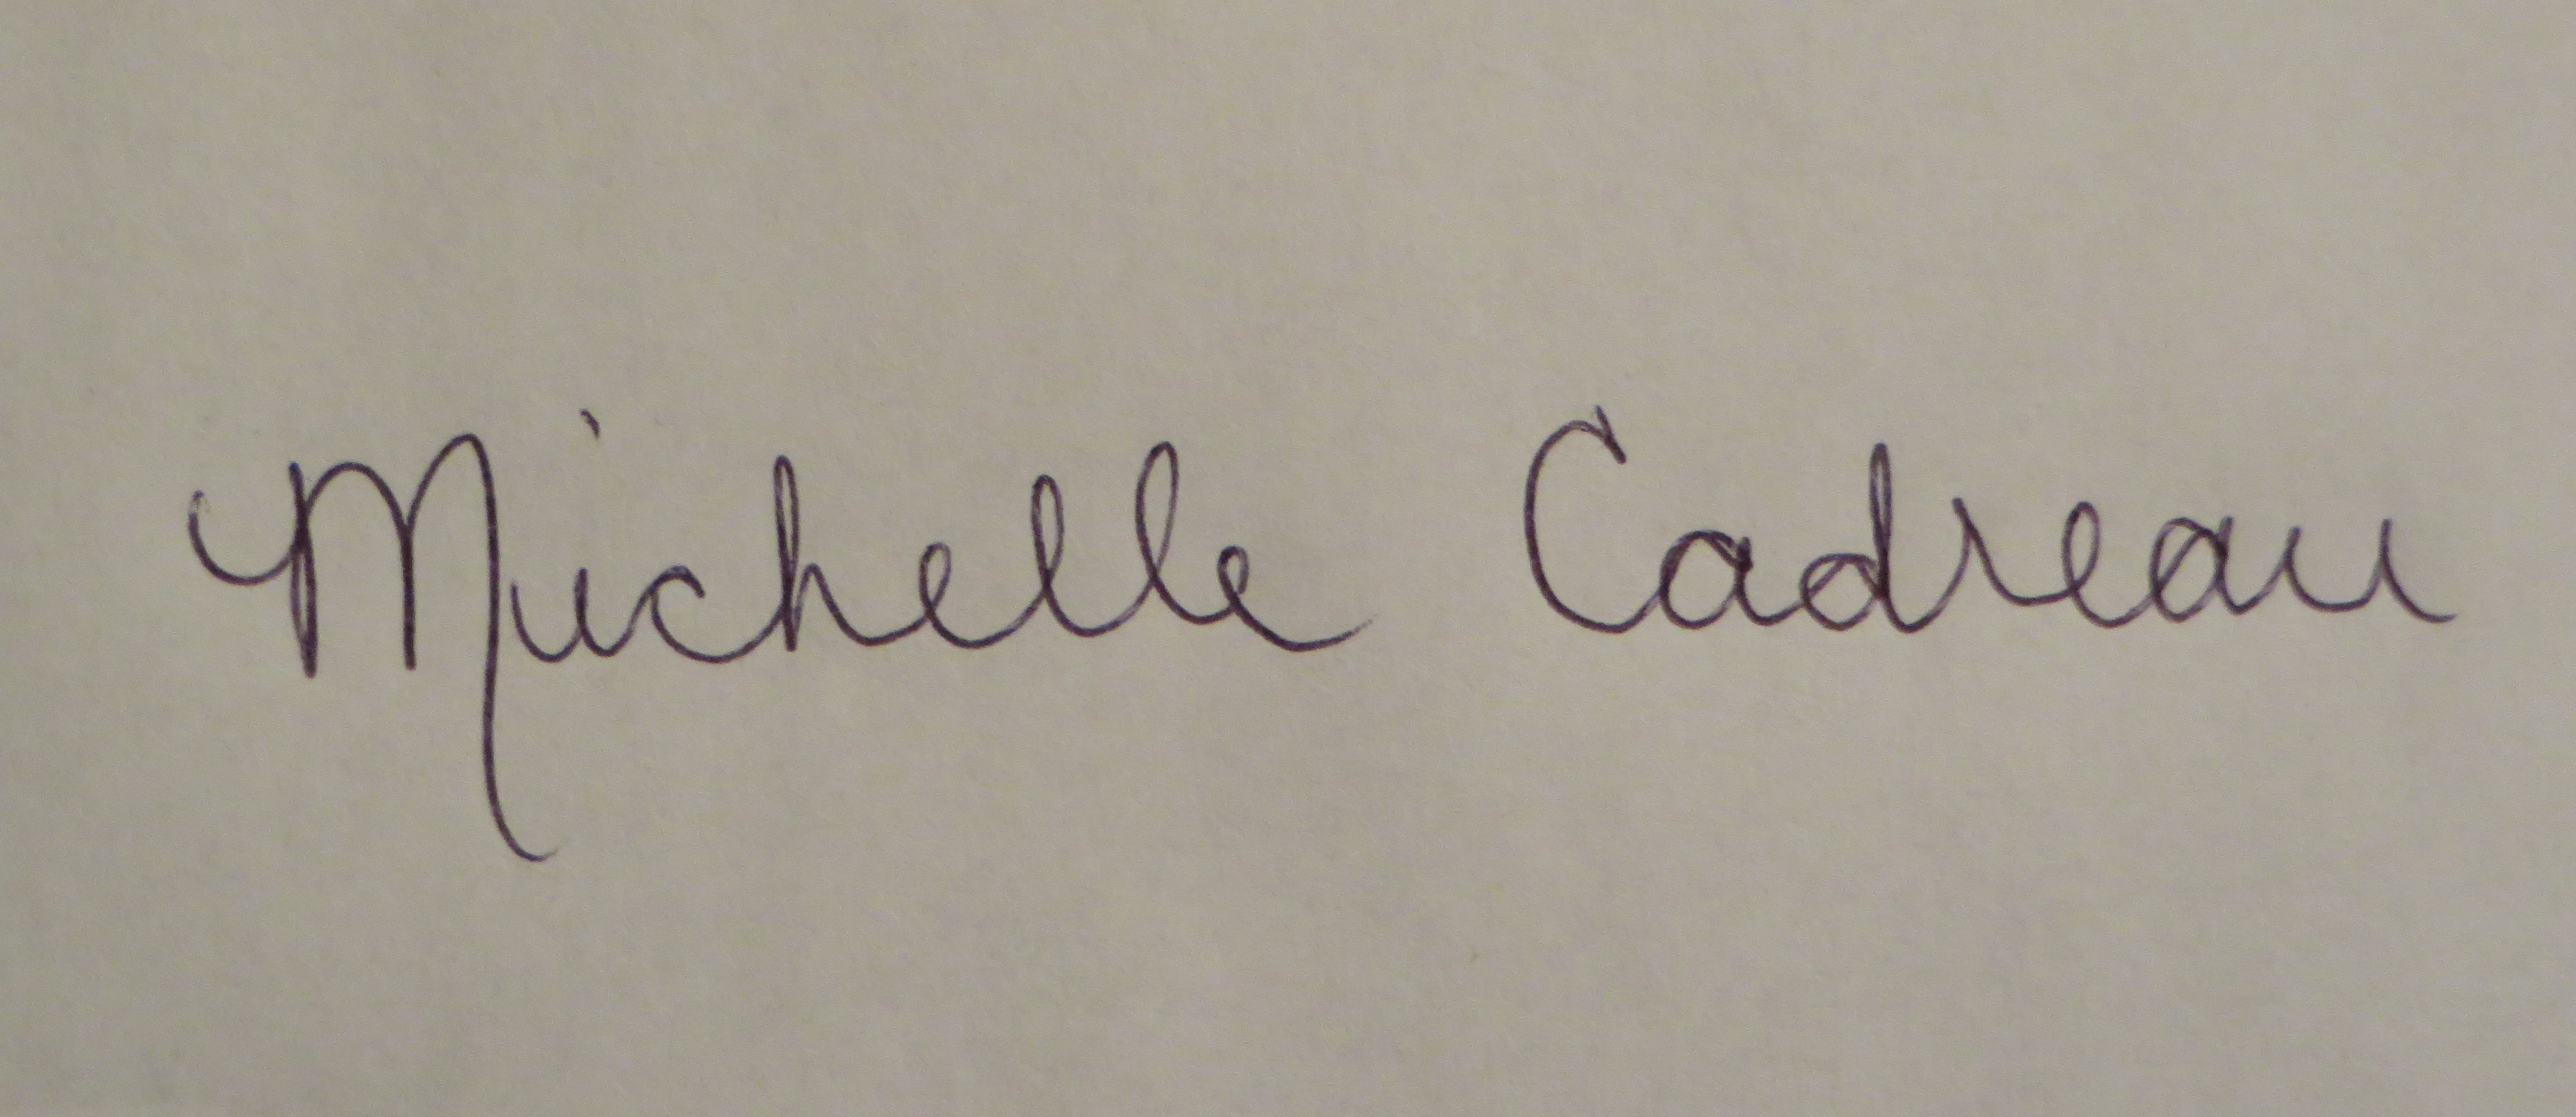 Michelle Cadreau Signature